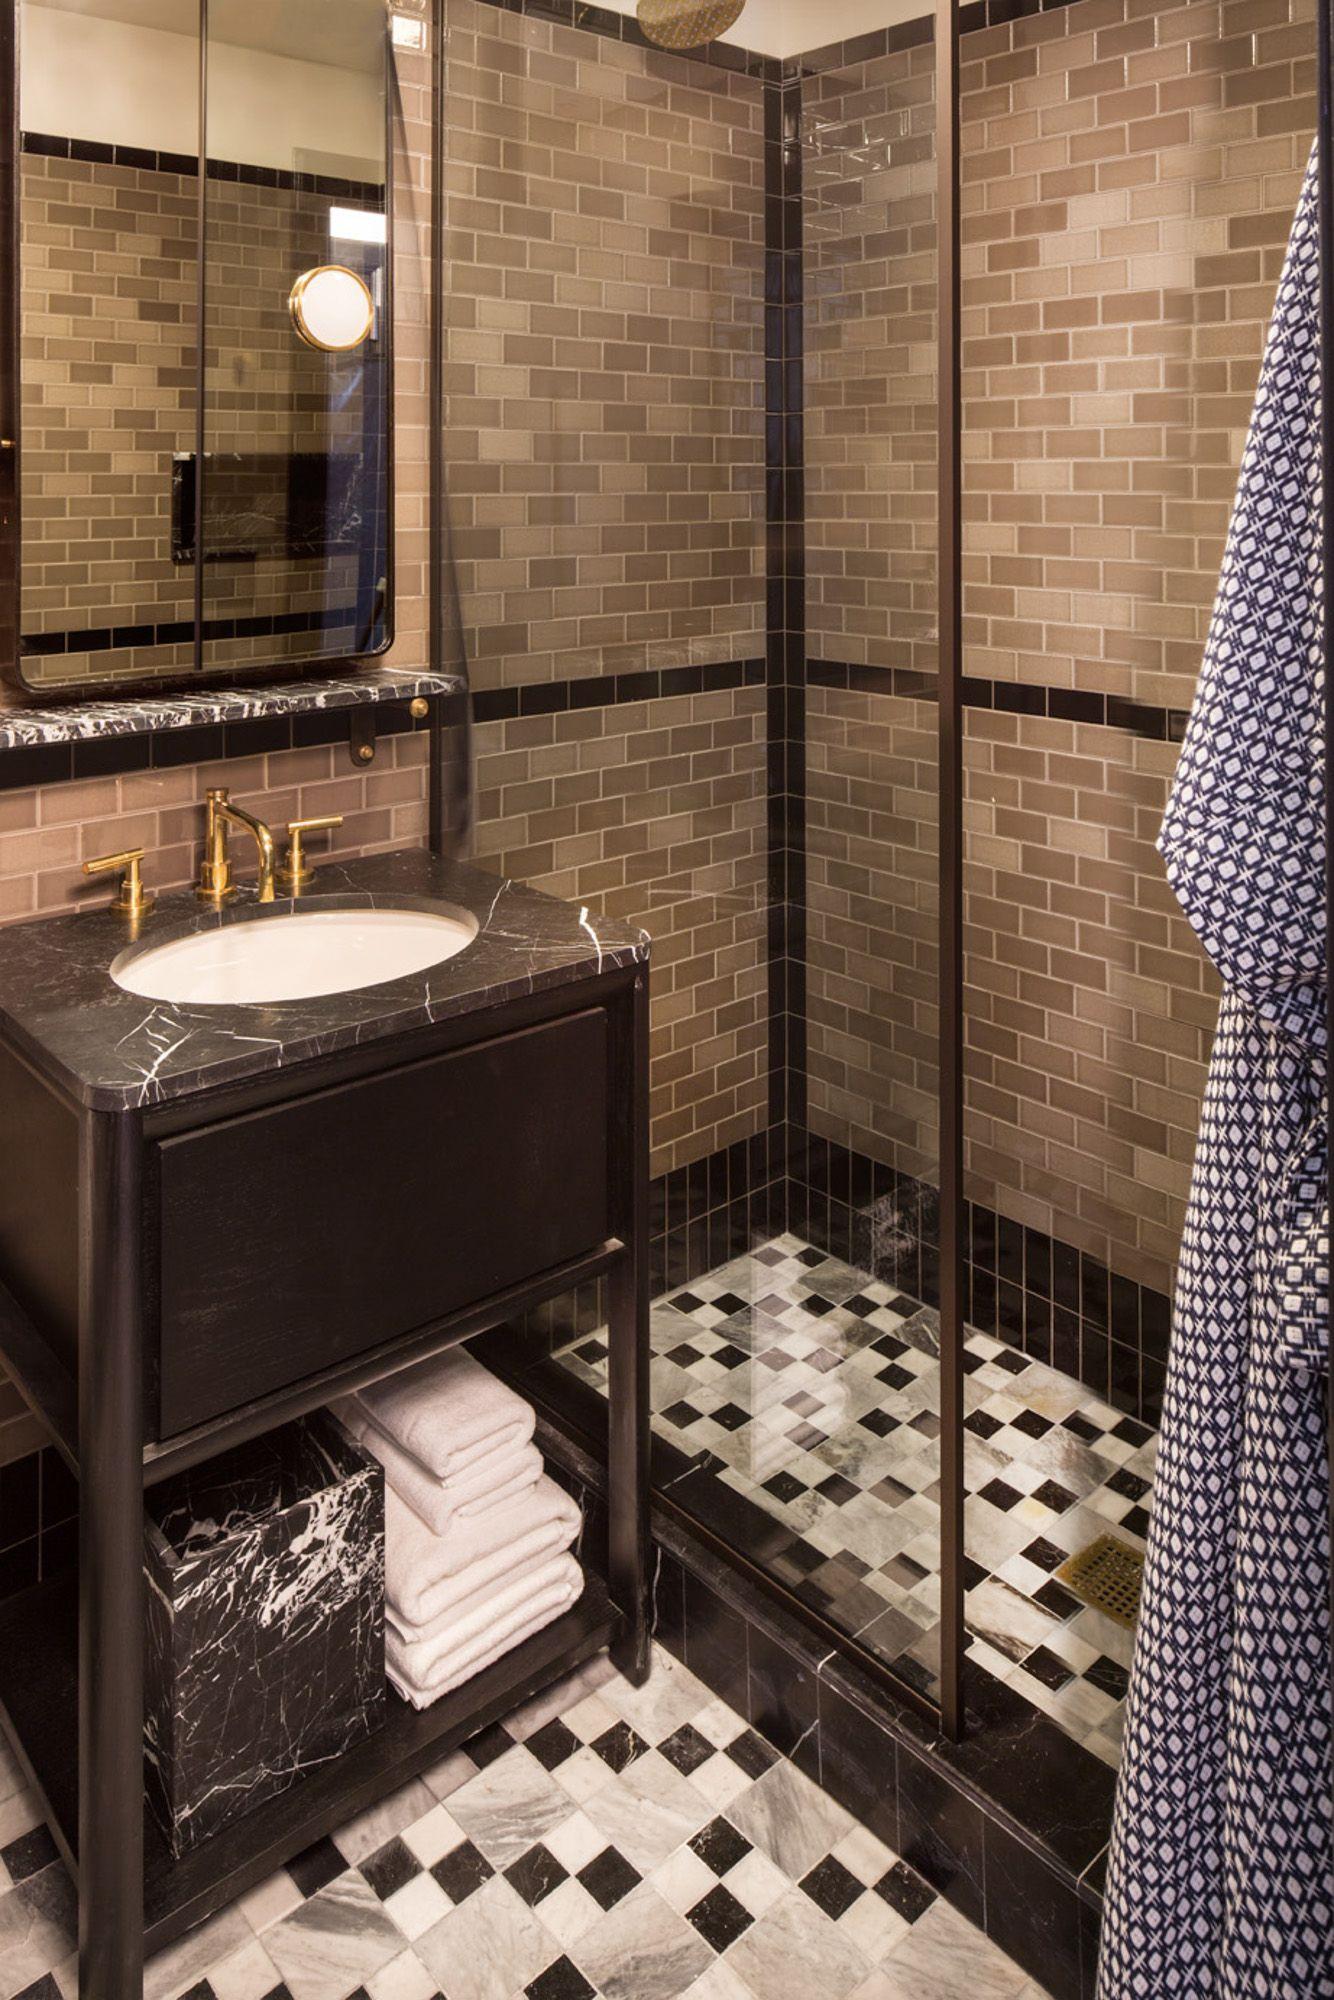 Tiled bathroom at san francisco proper hotel tiled bathroom at san francisco proper hotel kellywearstlerinteriordesign dailygadgetfo Images